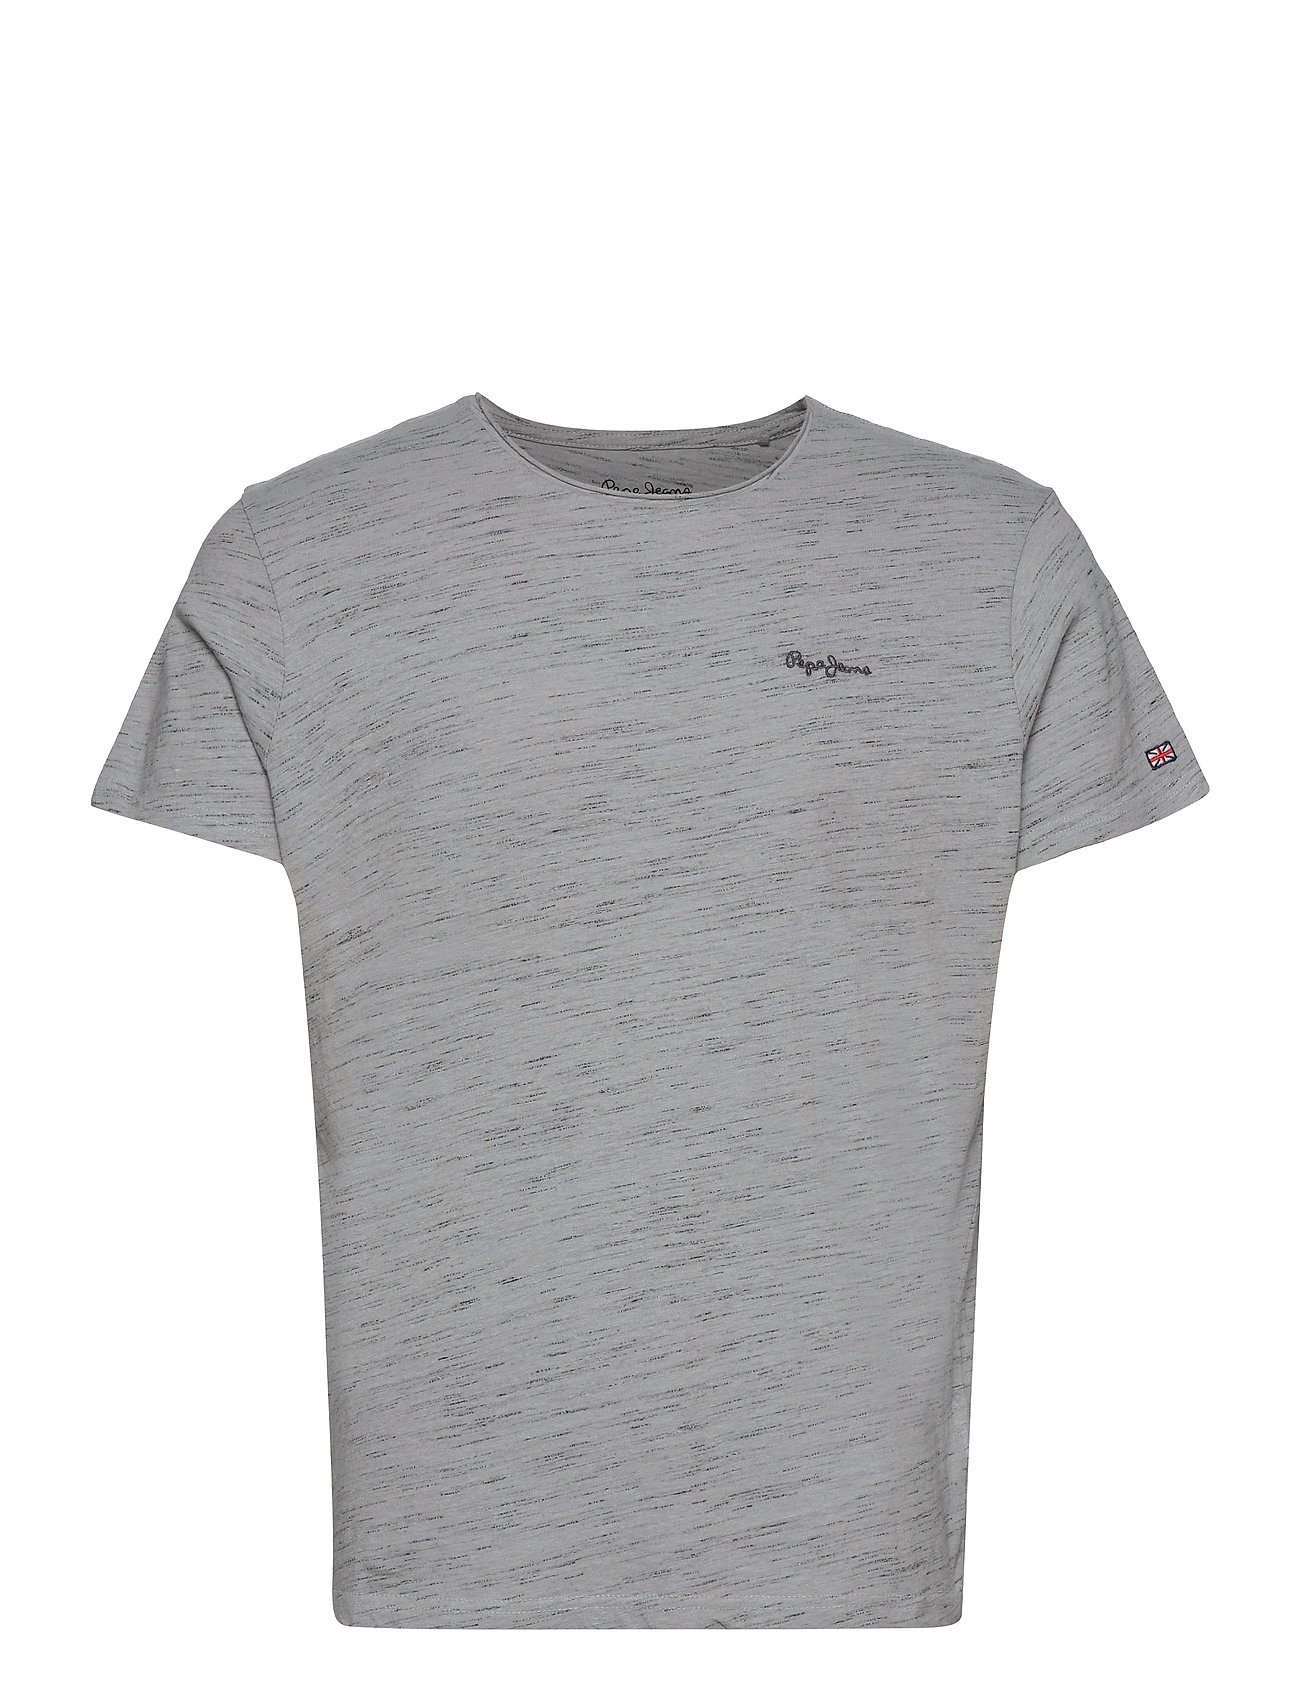 Image of Paul 4 T-shirt Grå Pepe Jeans London (3497243205)